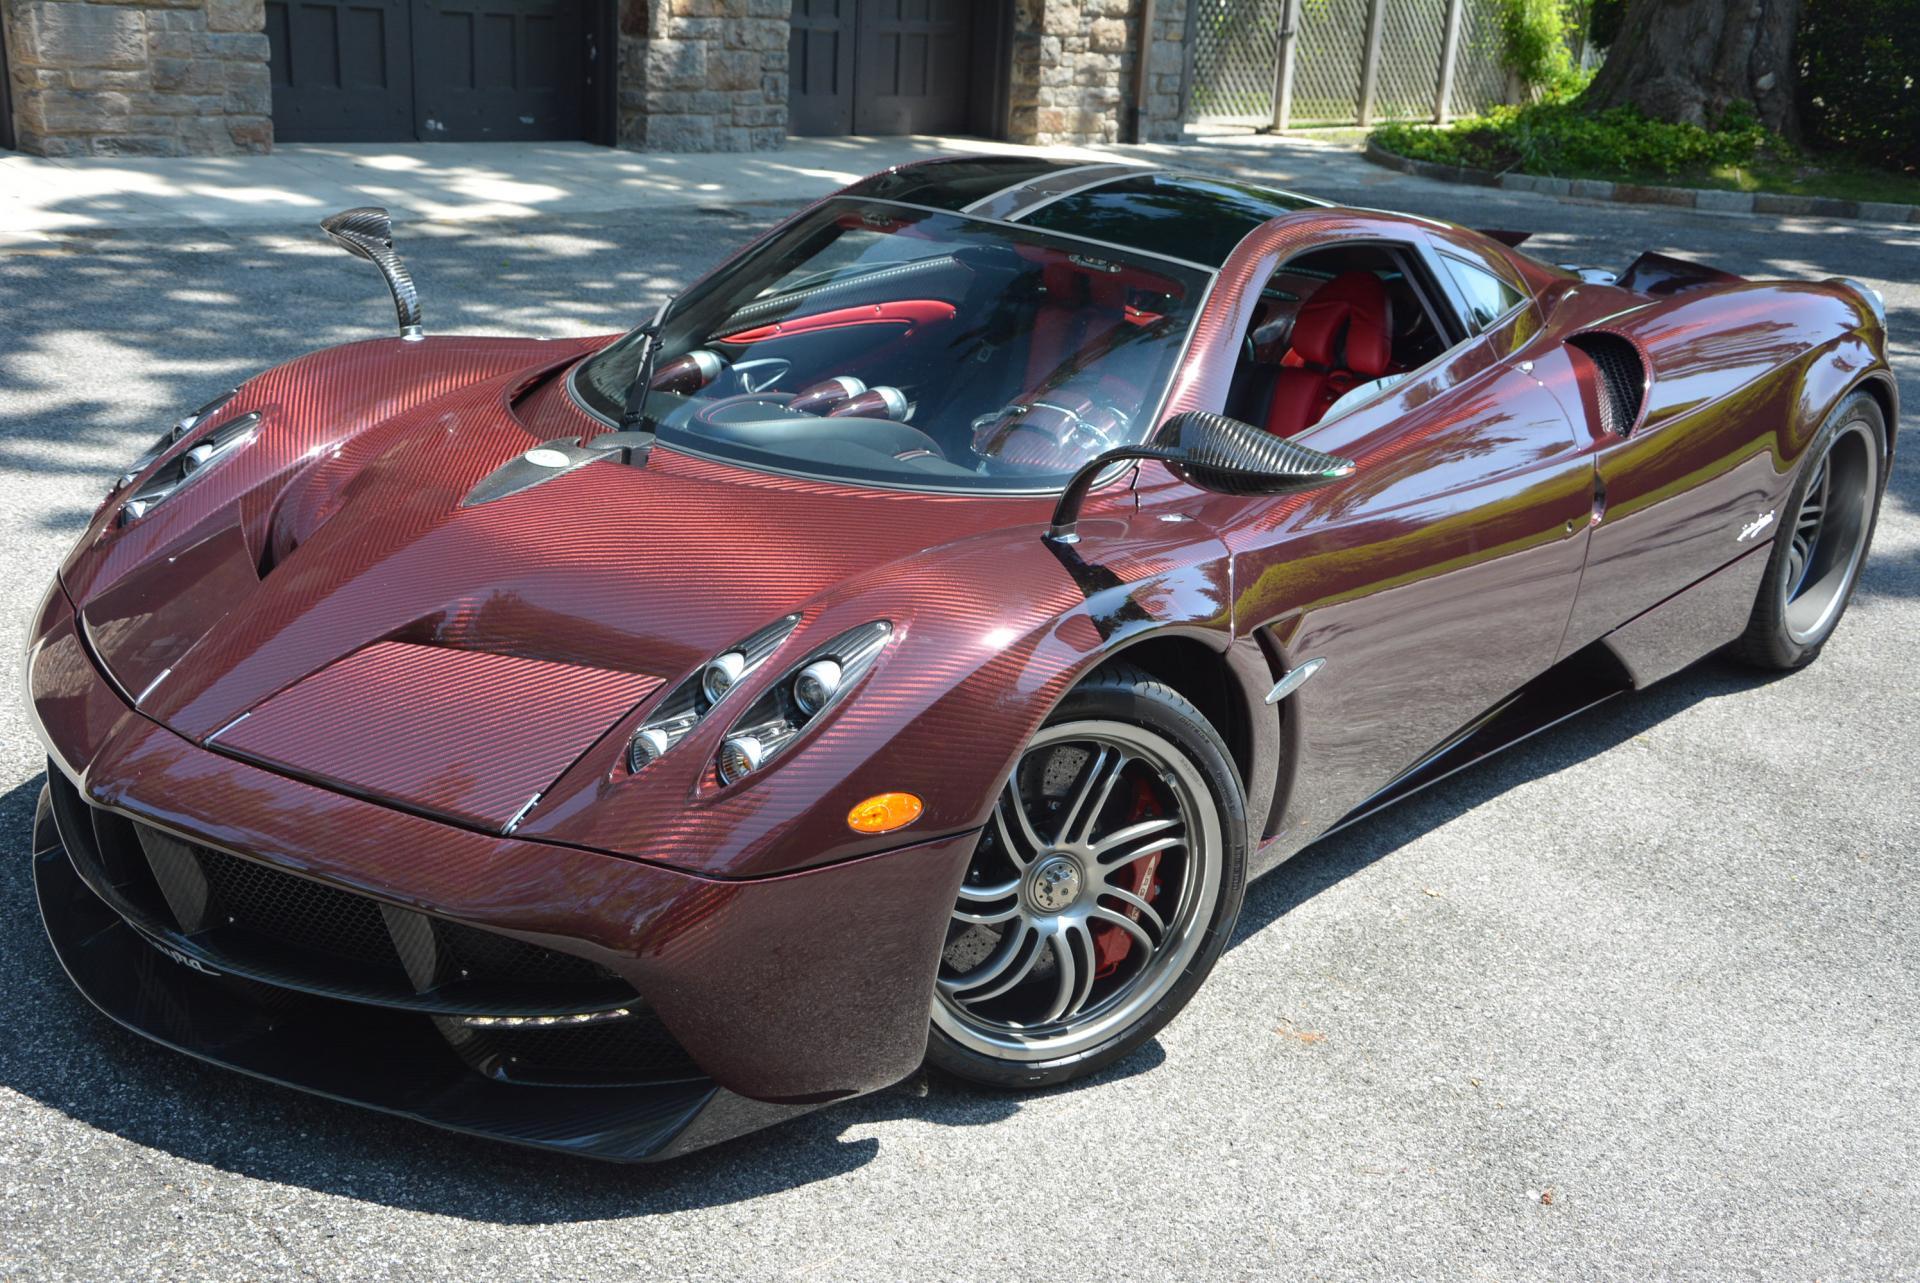 Used 2014 Pagani Huayra for sale Sold at Maserati of Westport in Westport CT 06880 1